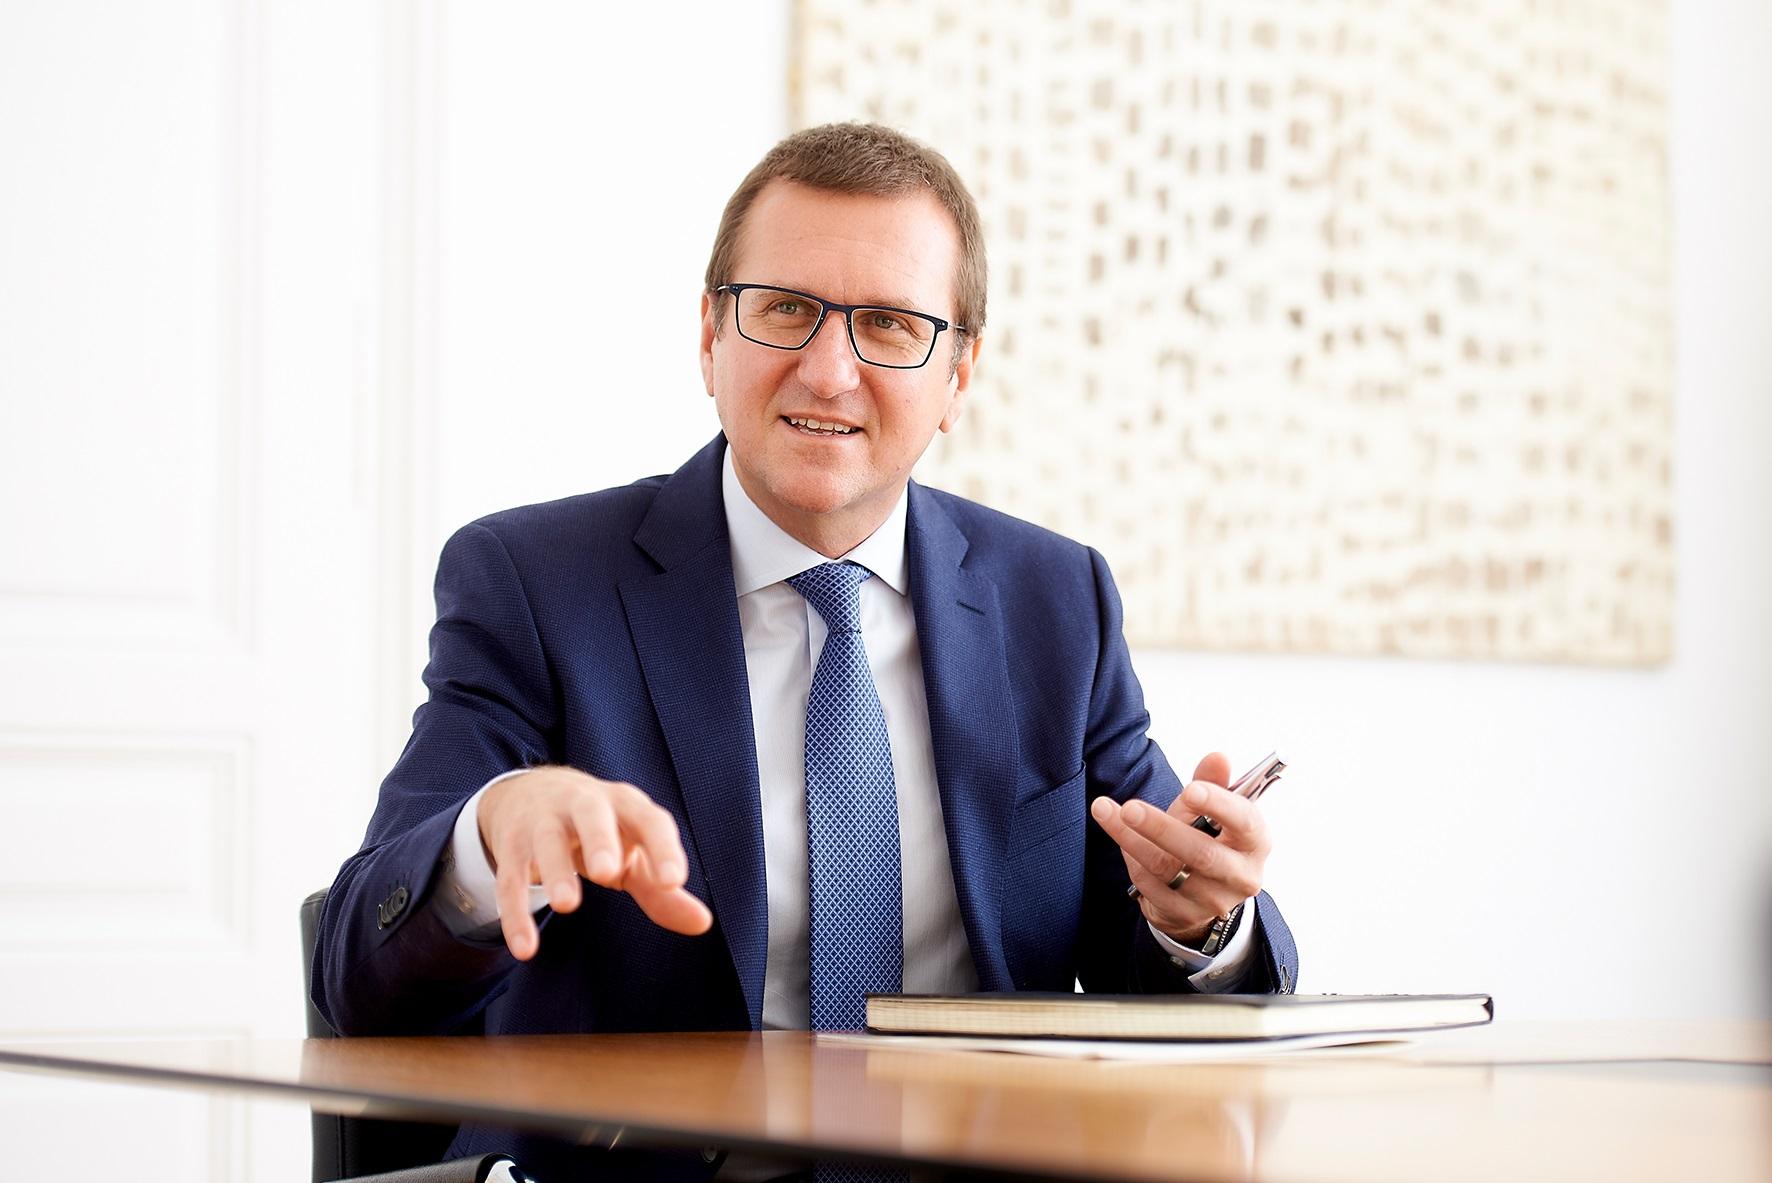 Christian Nemeth_2_c_Zuercher Kantonalbank Osterreich         AG.jpg